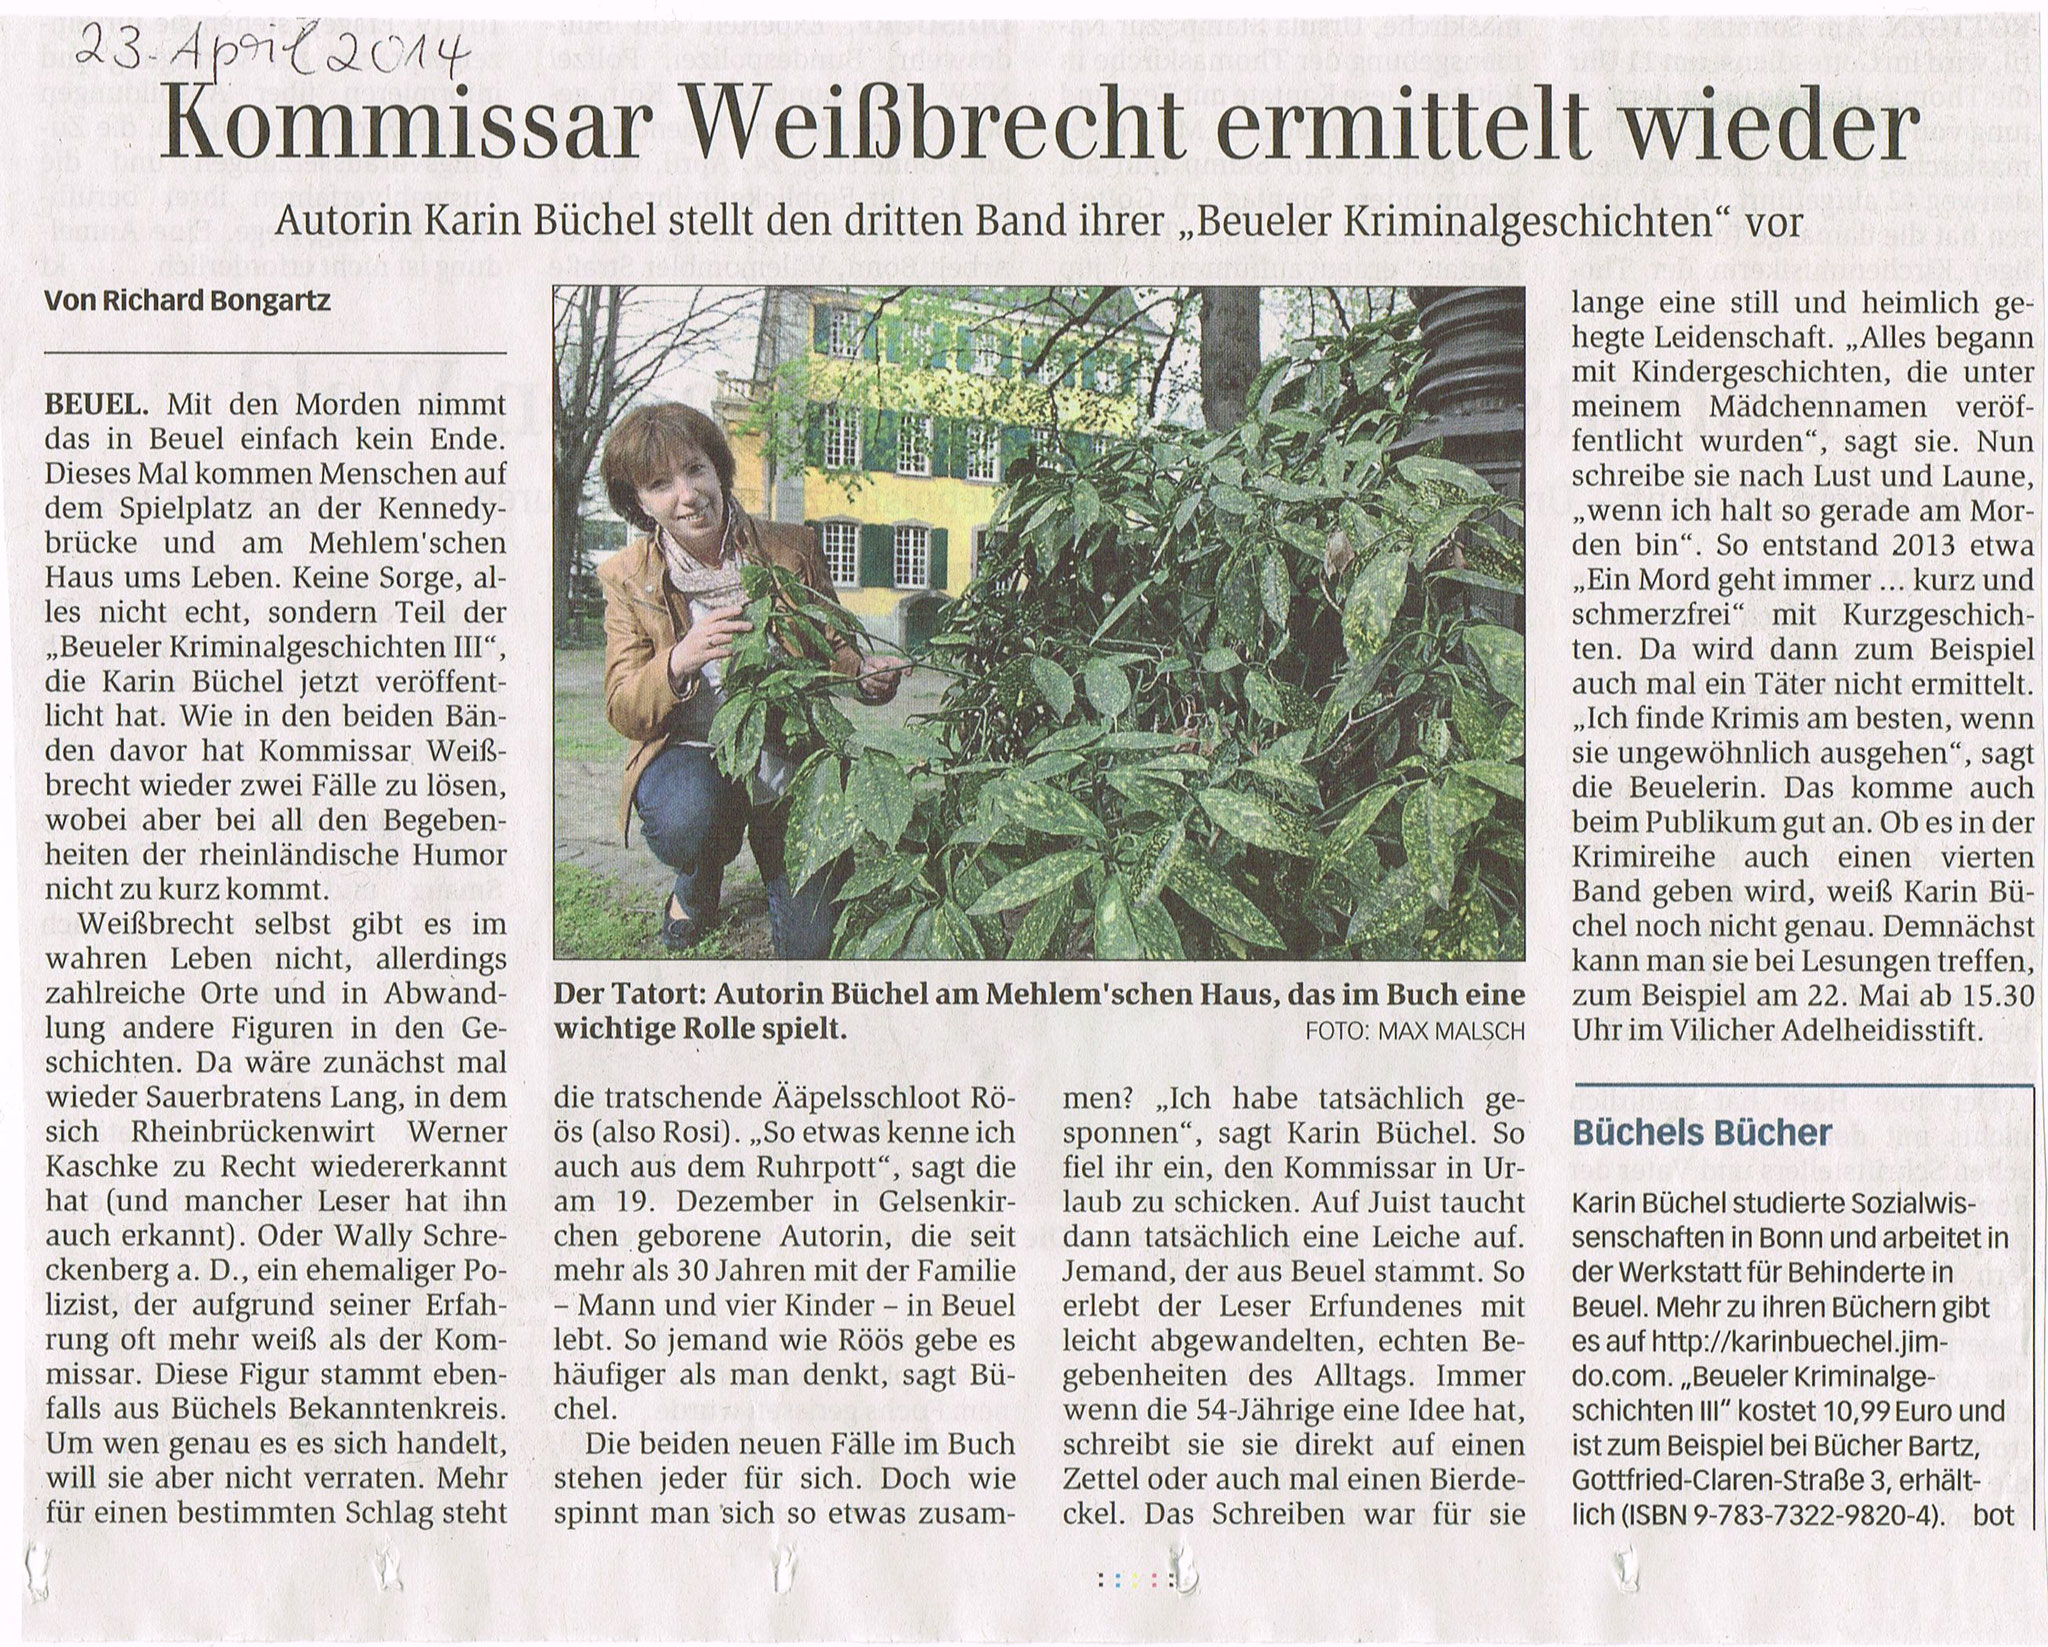 General-Anzeiger, 23. April 2014